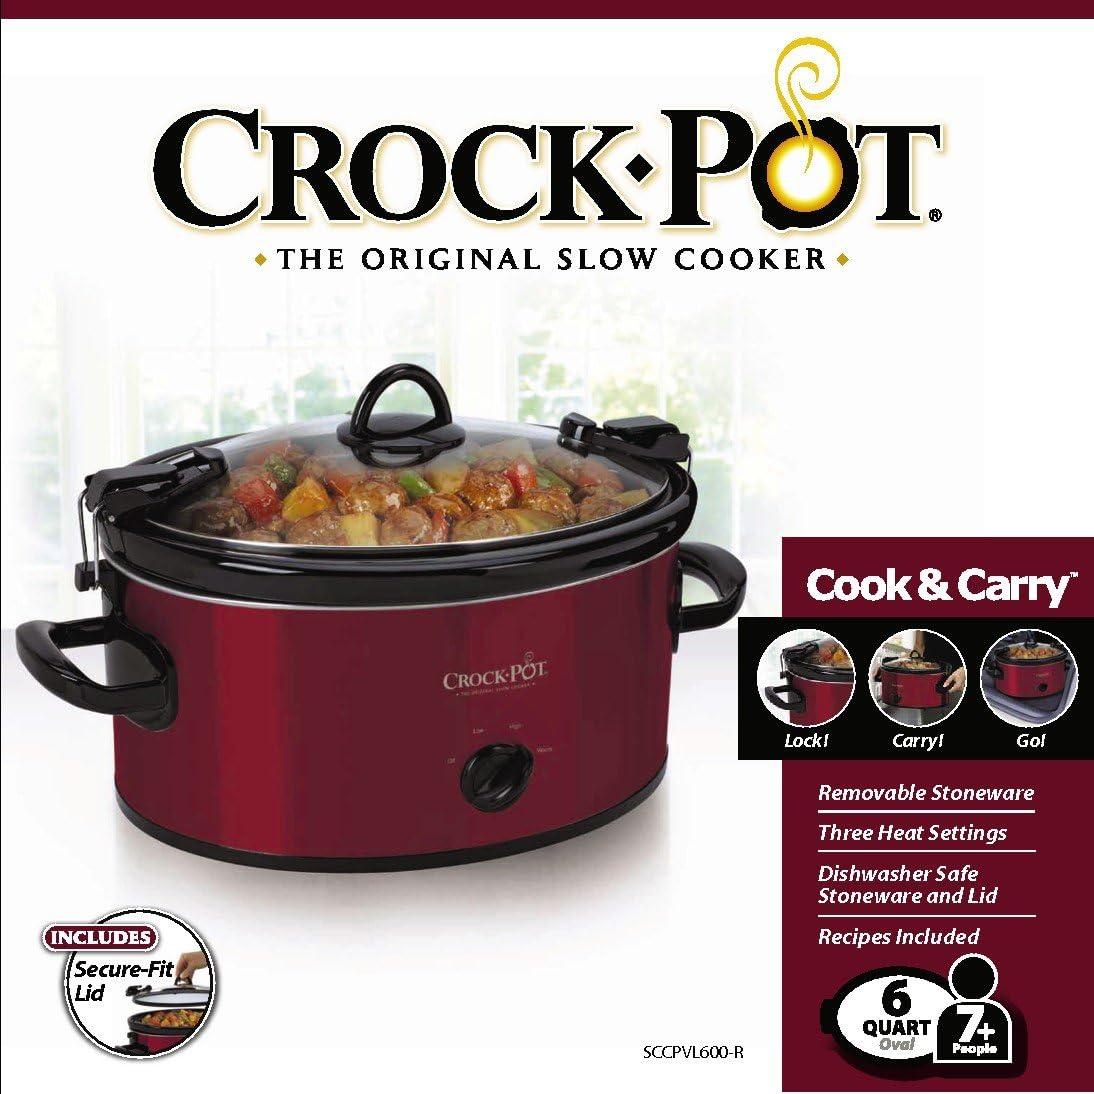 Crock-Pot 6-Quart Cook & Carry Oval Manual Portable Slow Cooker, Red - SCCPVL600-R: Crockpot: Kitchen & Dining